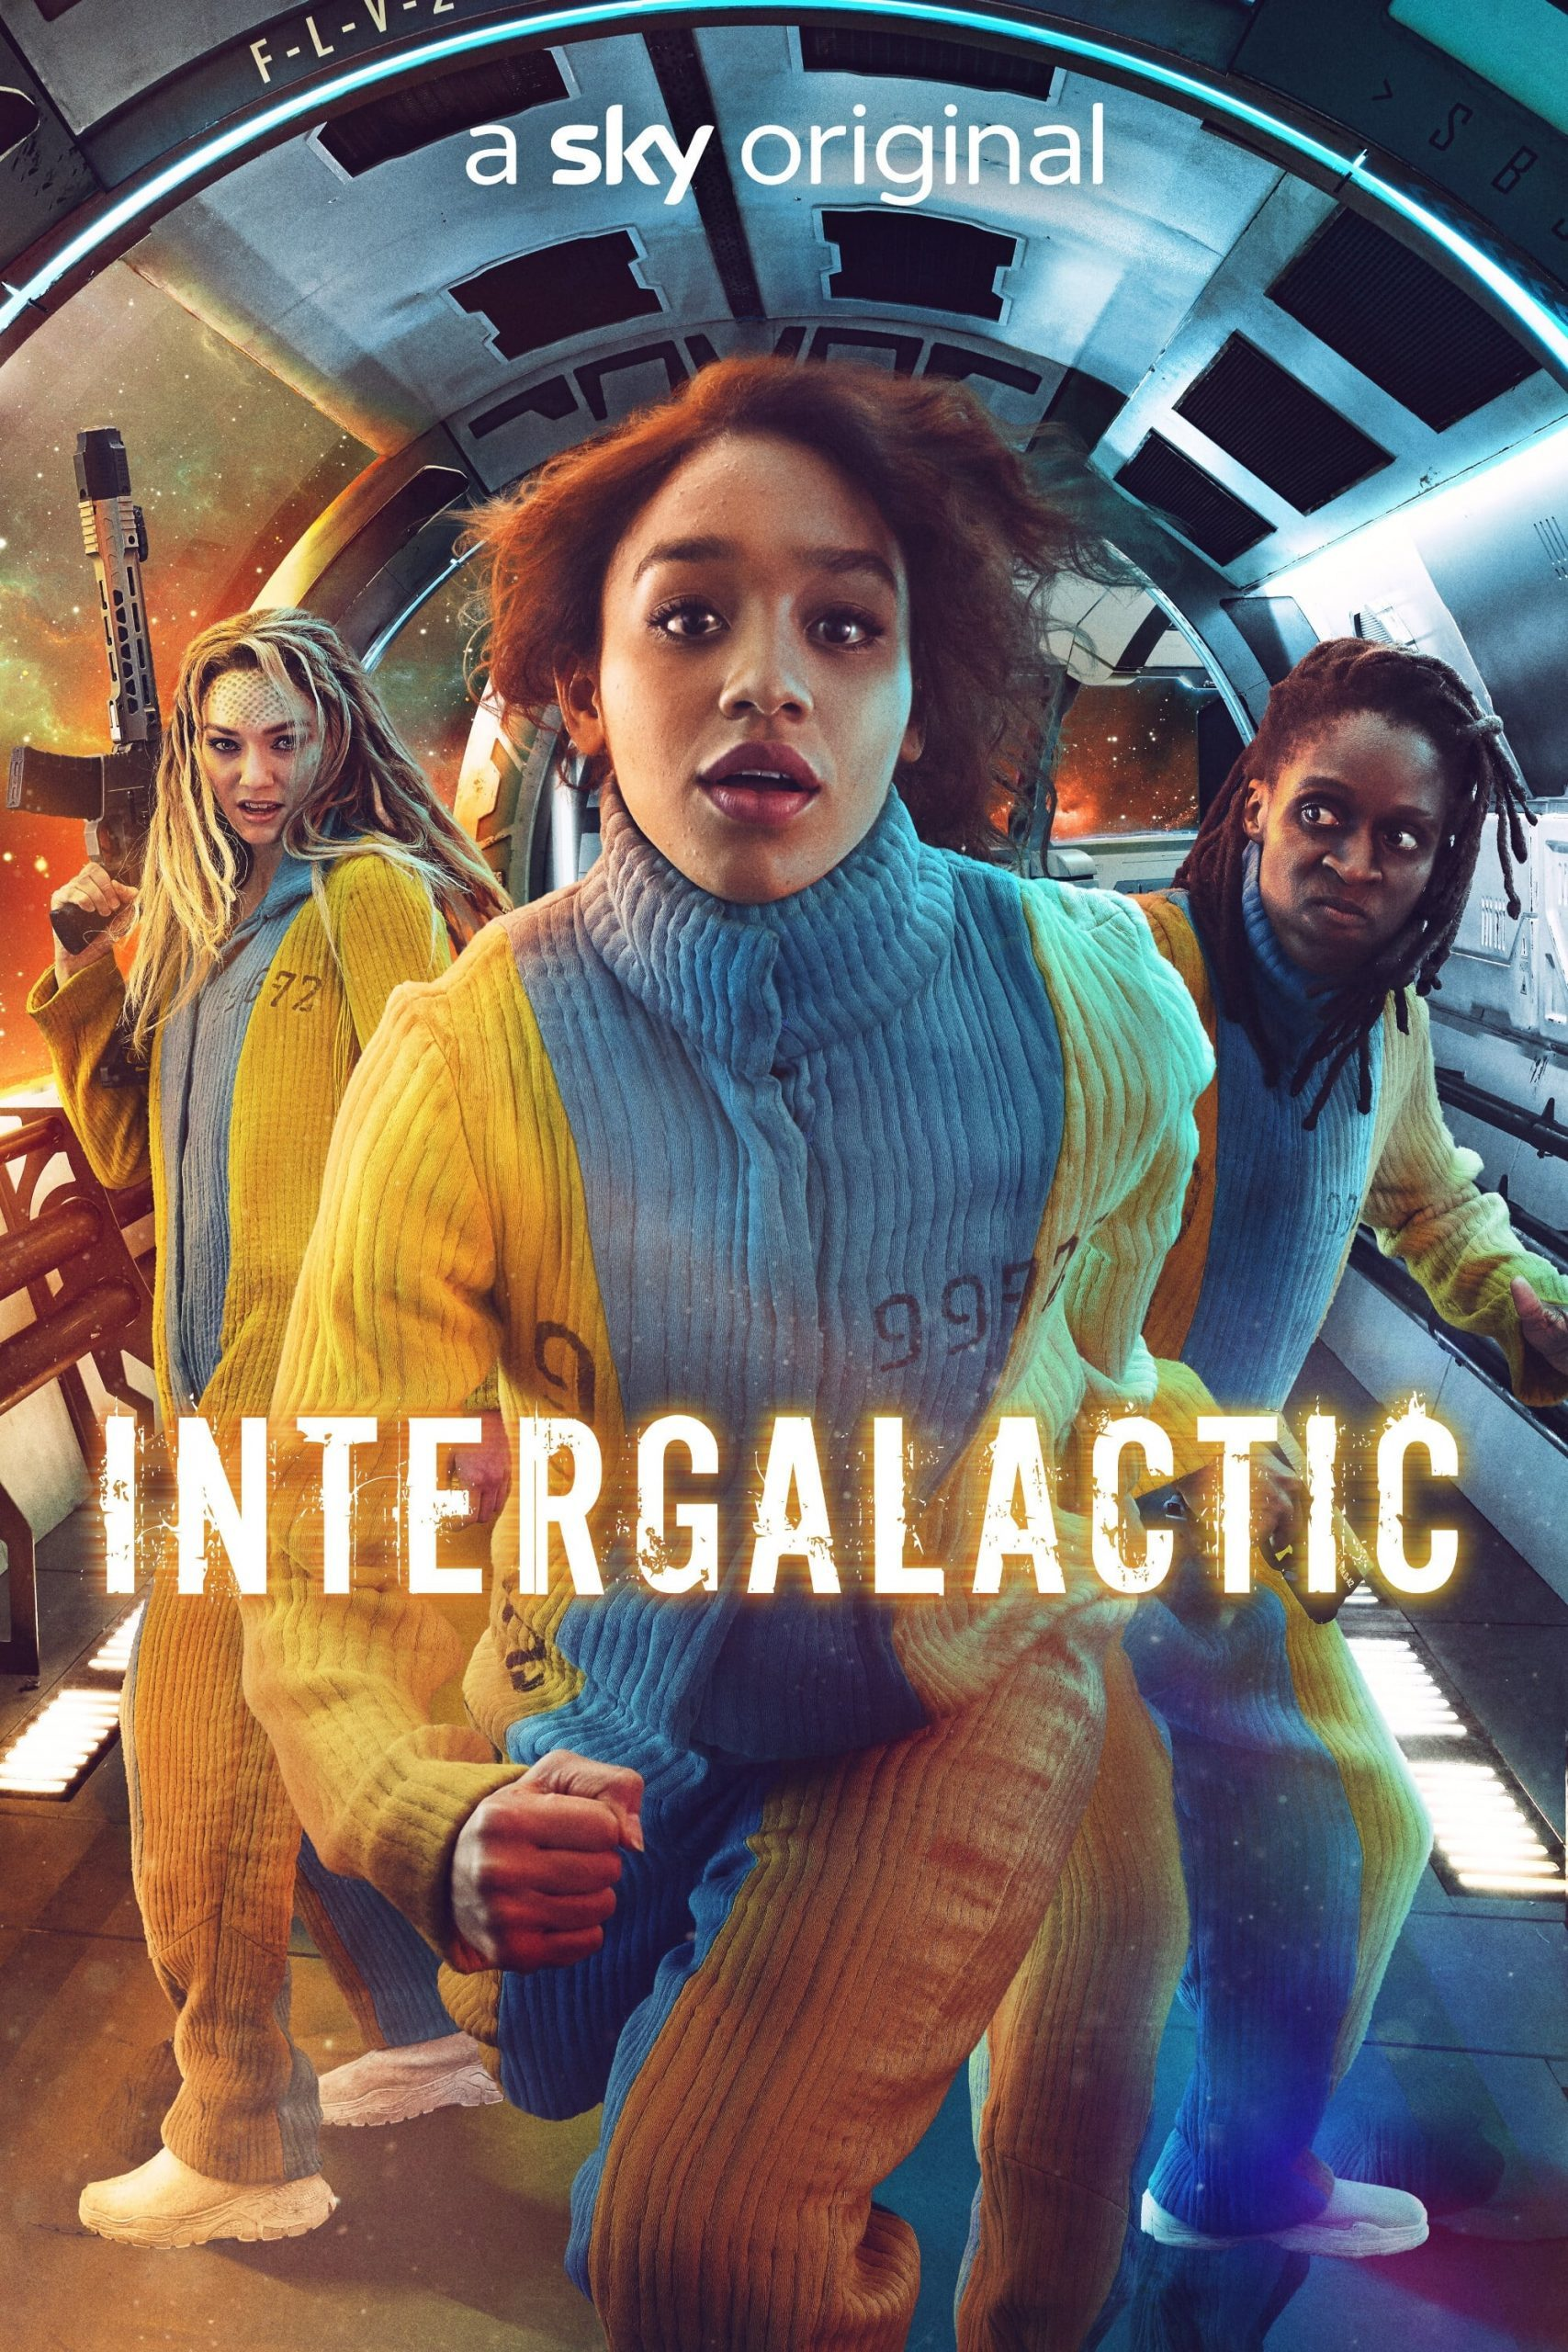 Intergalactic Complete Season 1 Download MP4 HD